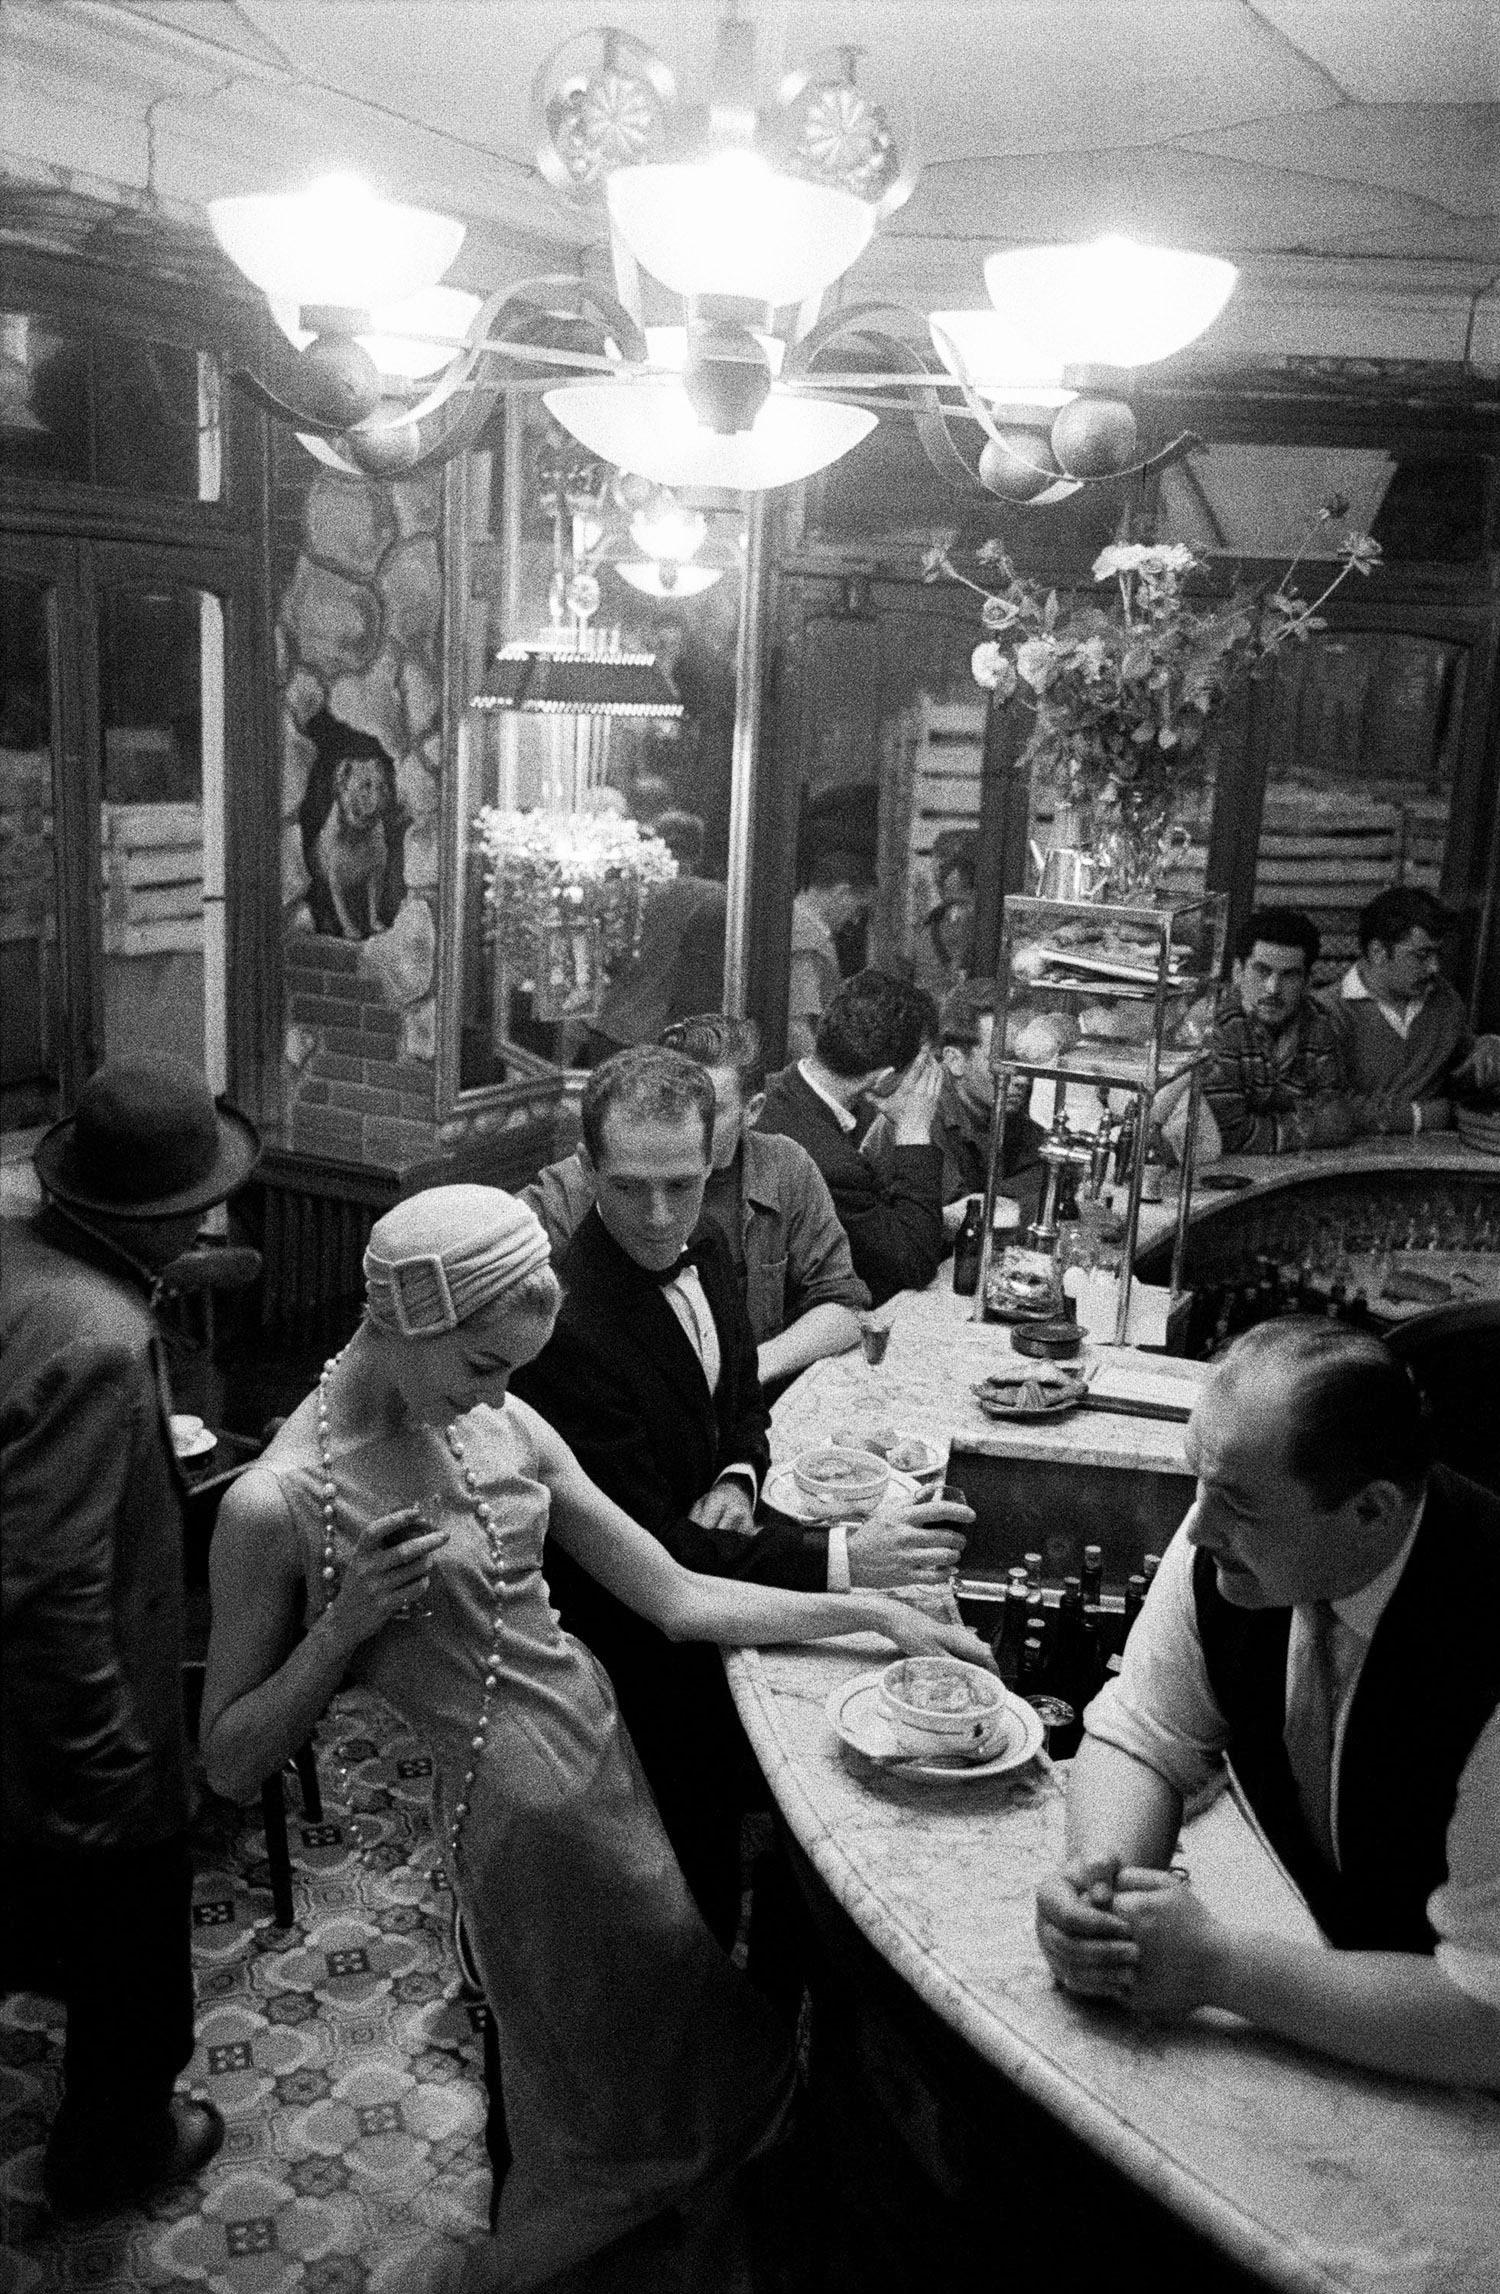 1957-Paris-France-for-JDM-Tan-Arnold-at-Chien-qui-Fume-a